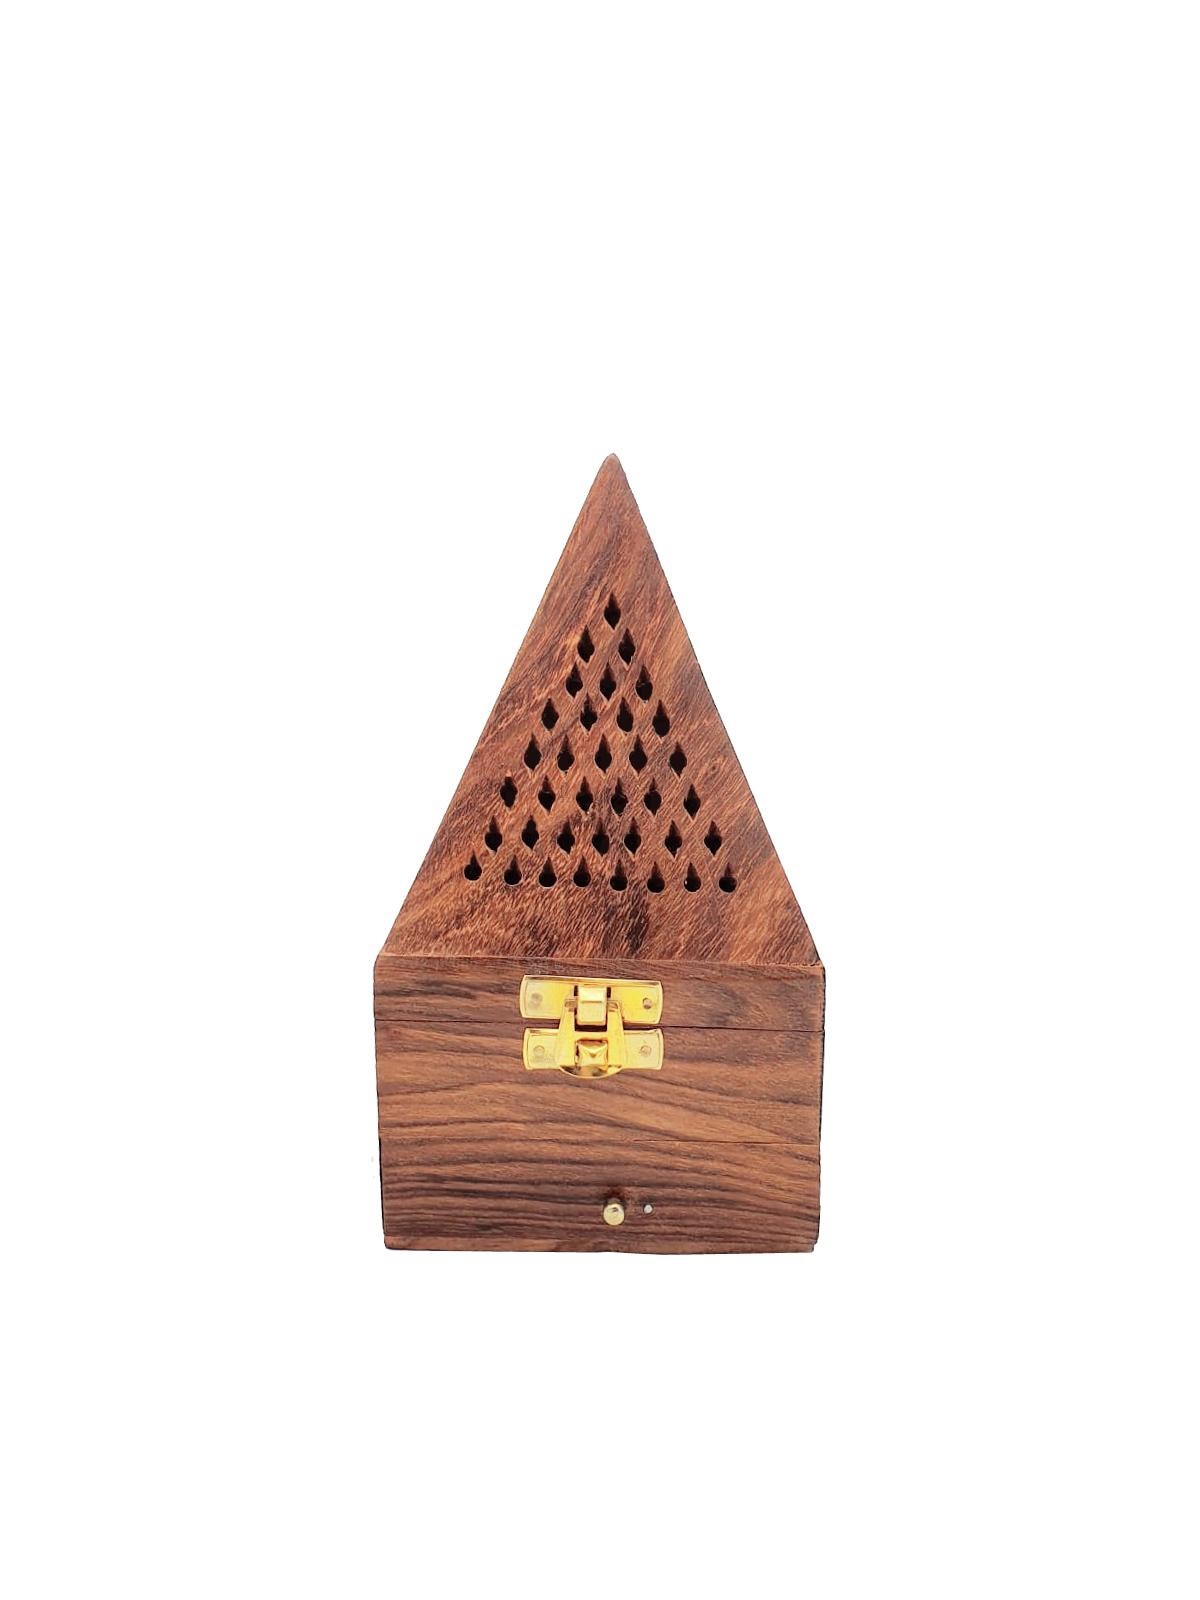 Buy Wooden Pyramid Incense Burner - Small